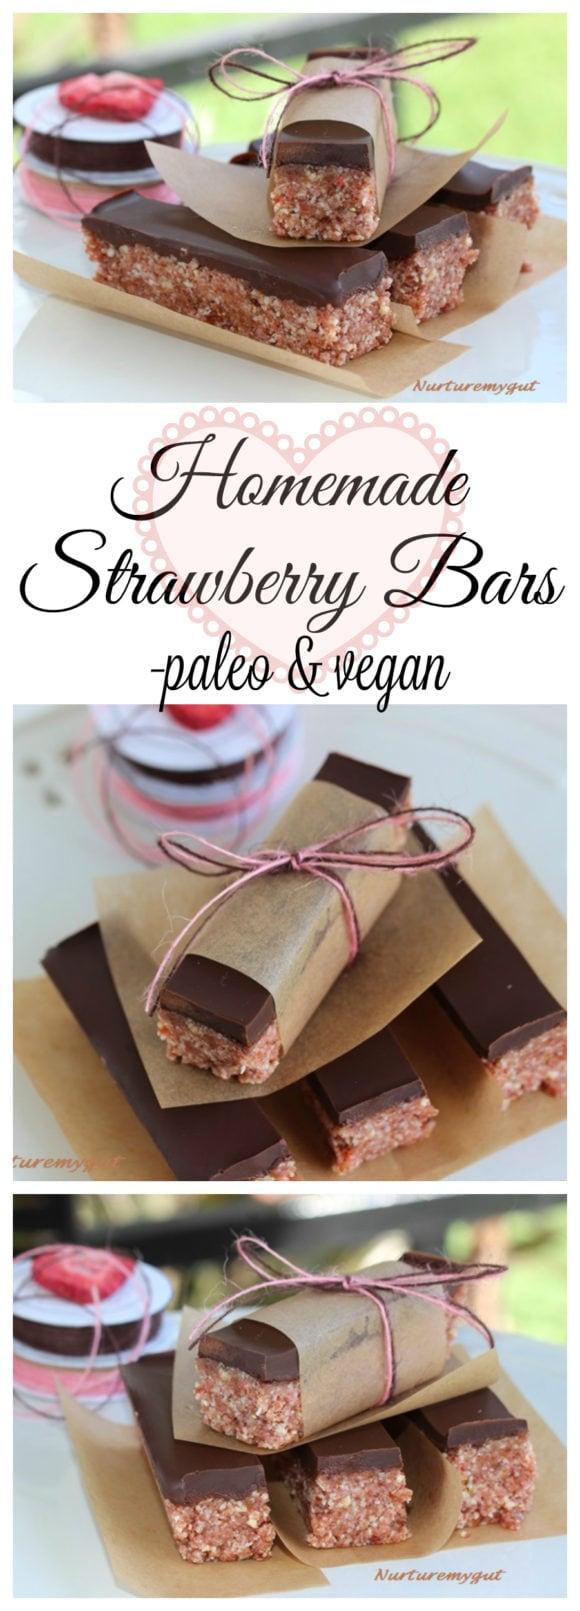 homemade strawberry bars